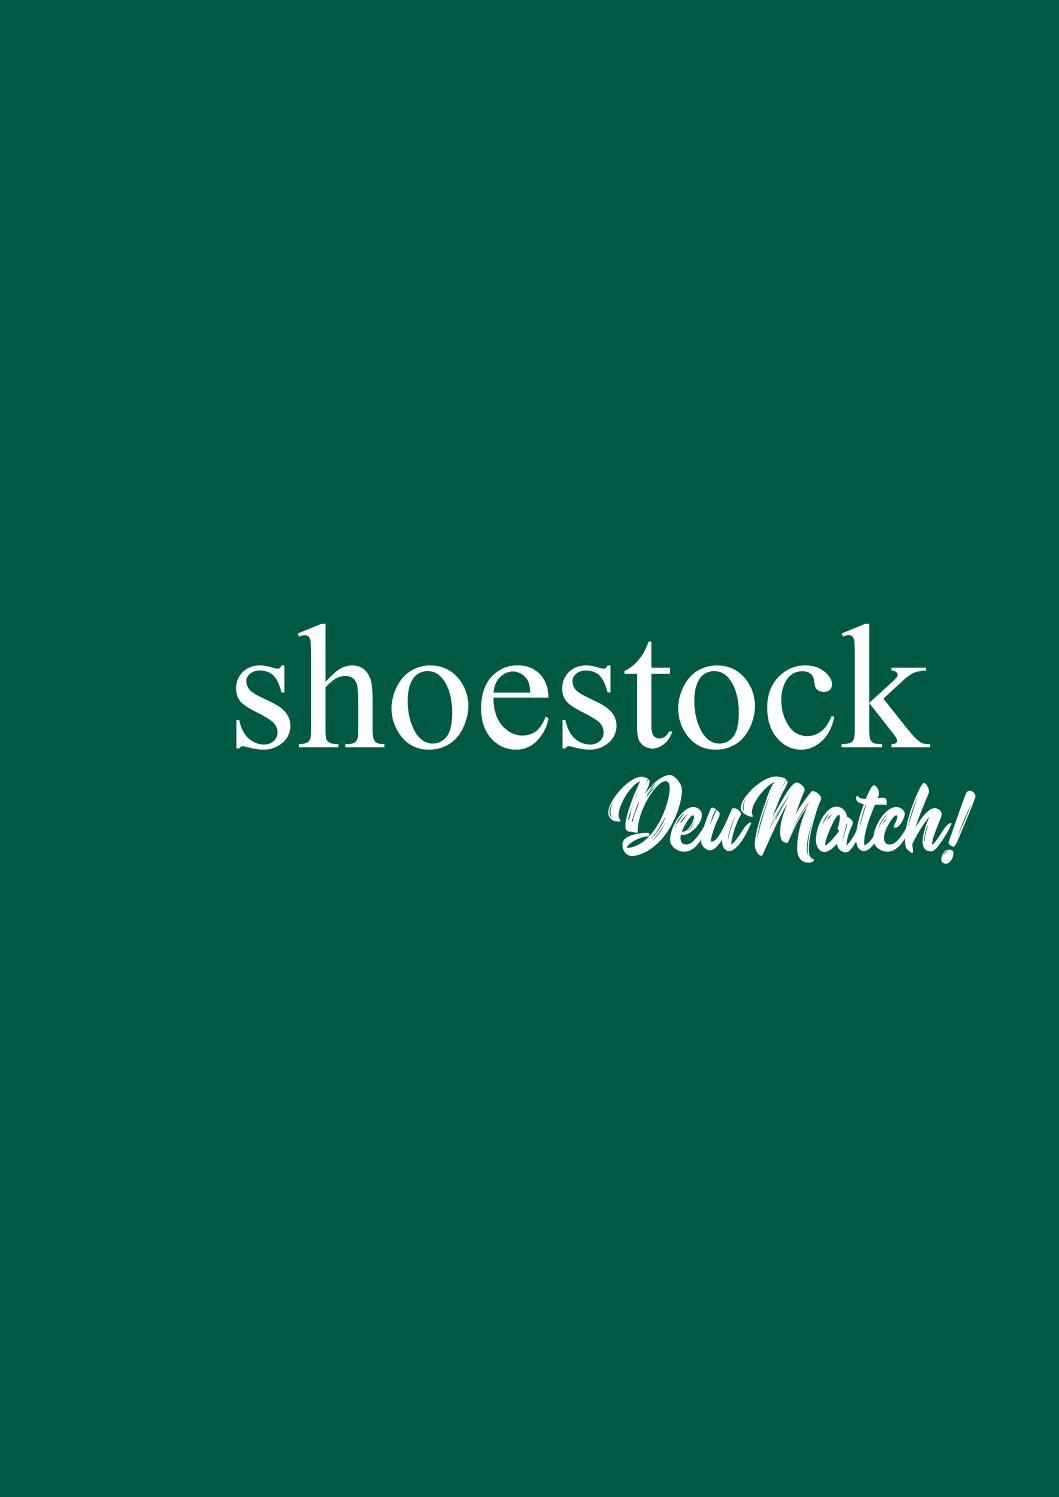 2eb9b4aa3 Tcc shoestock move by Mauricio Santos - issuu